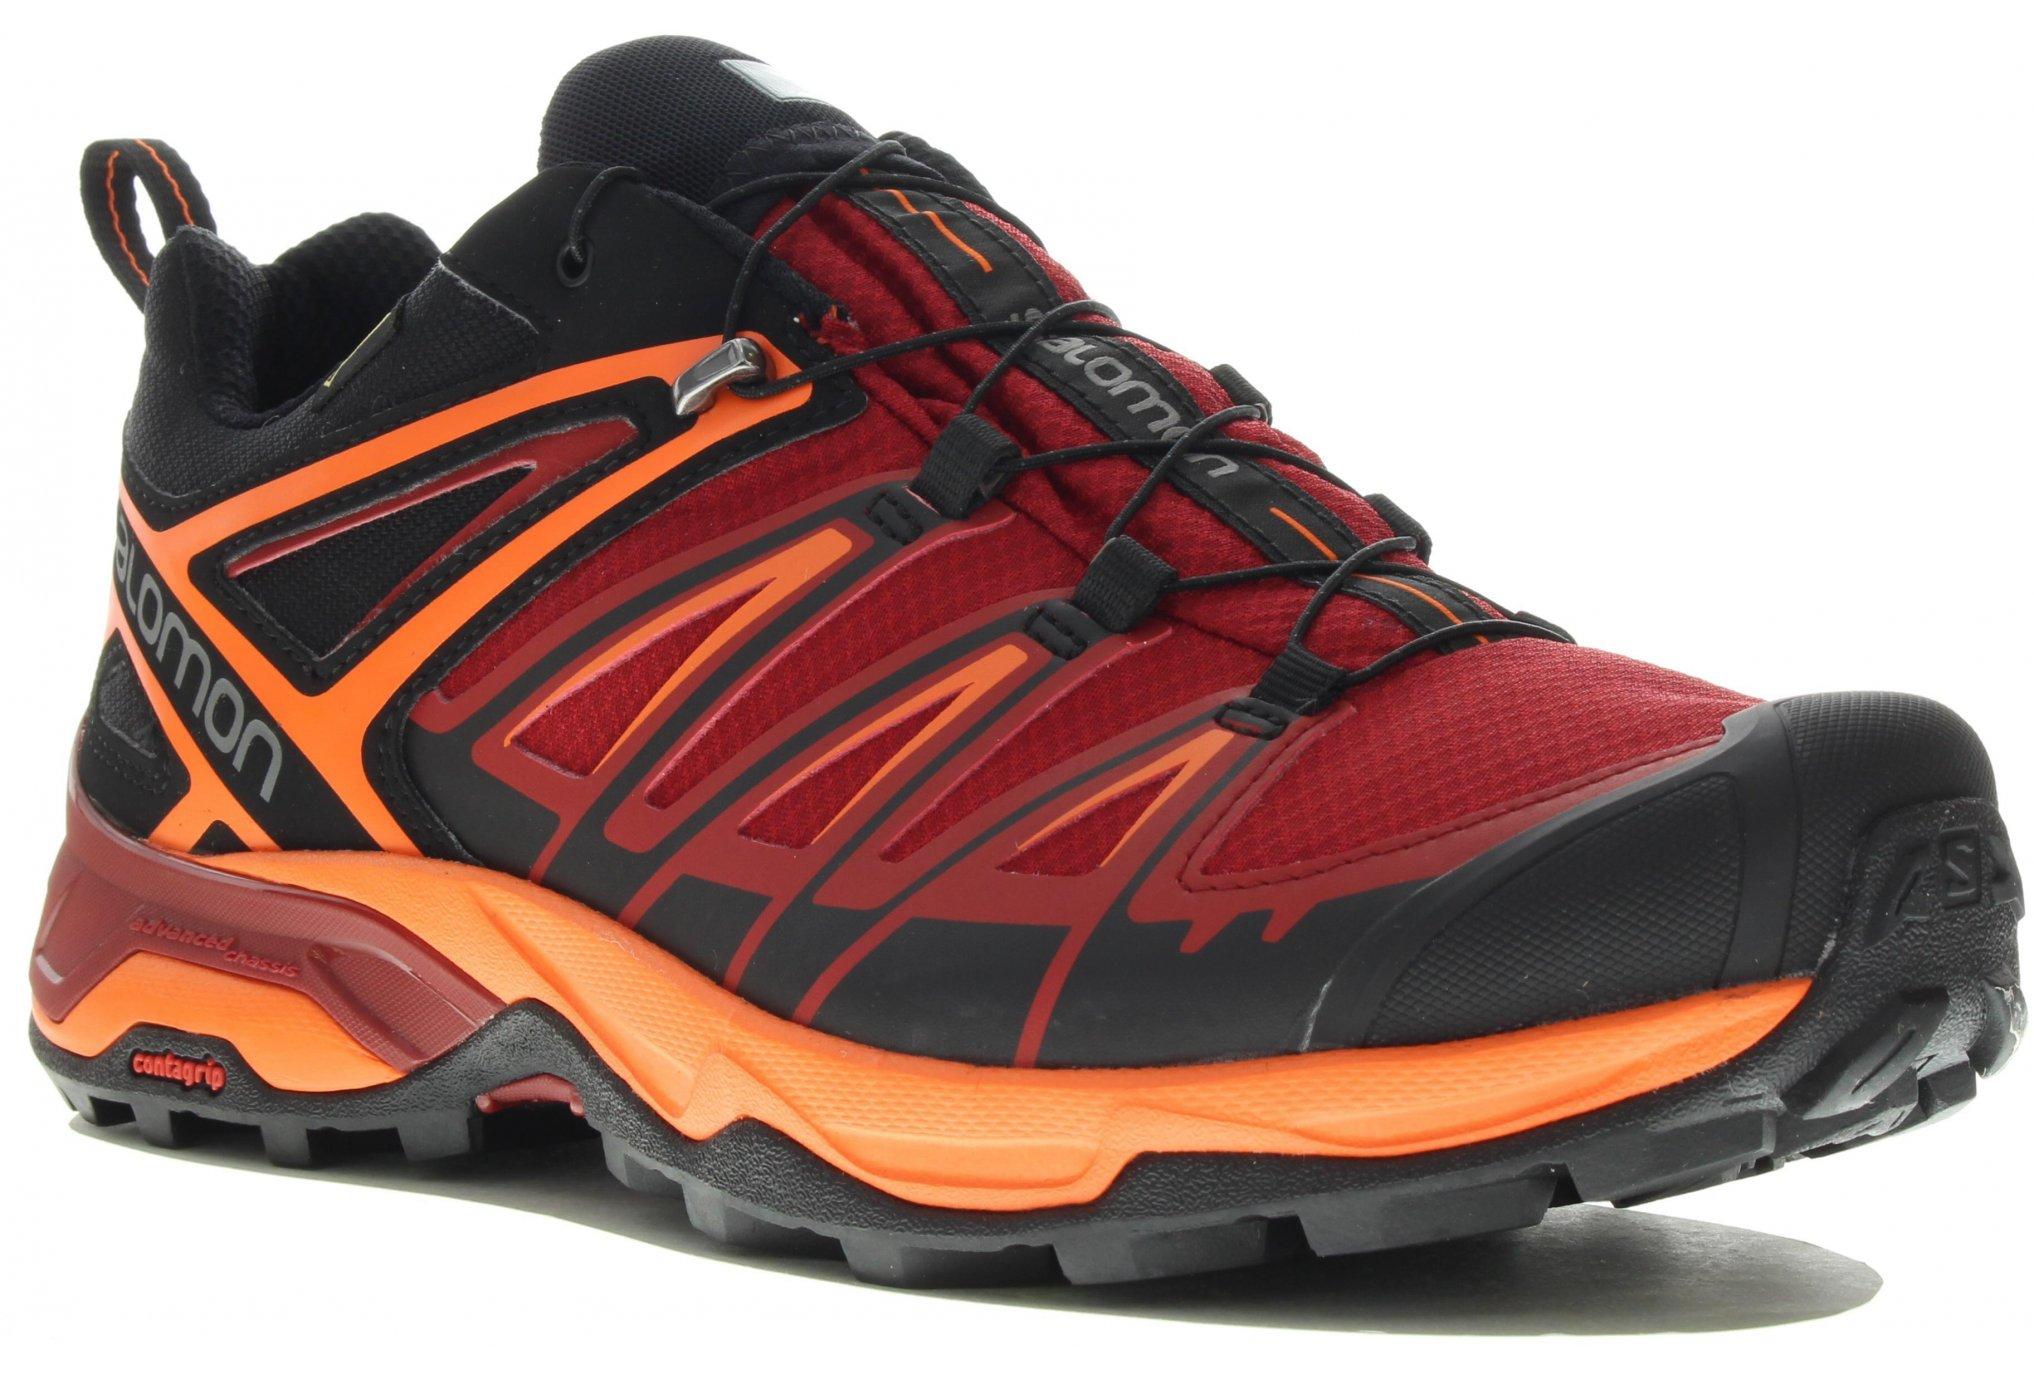 Homme Ultra Chaussures 3 Gore Trail Session Tex X M Salomon gxxUqz